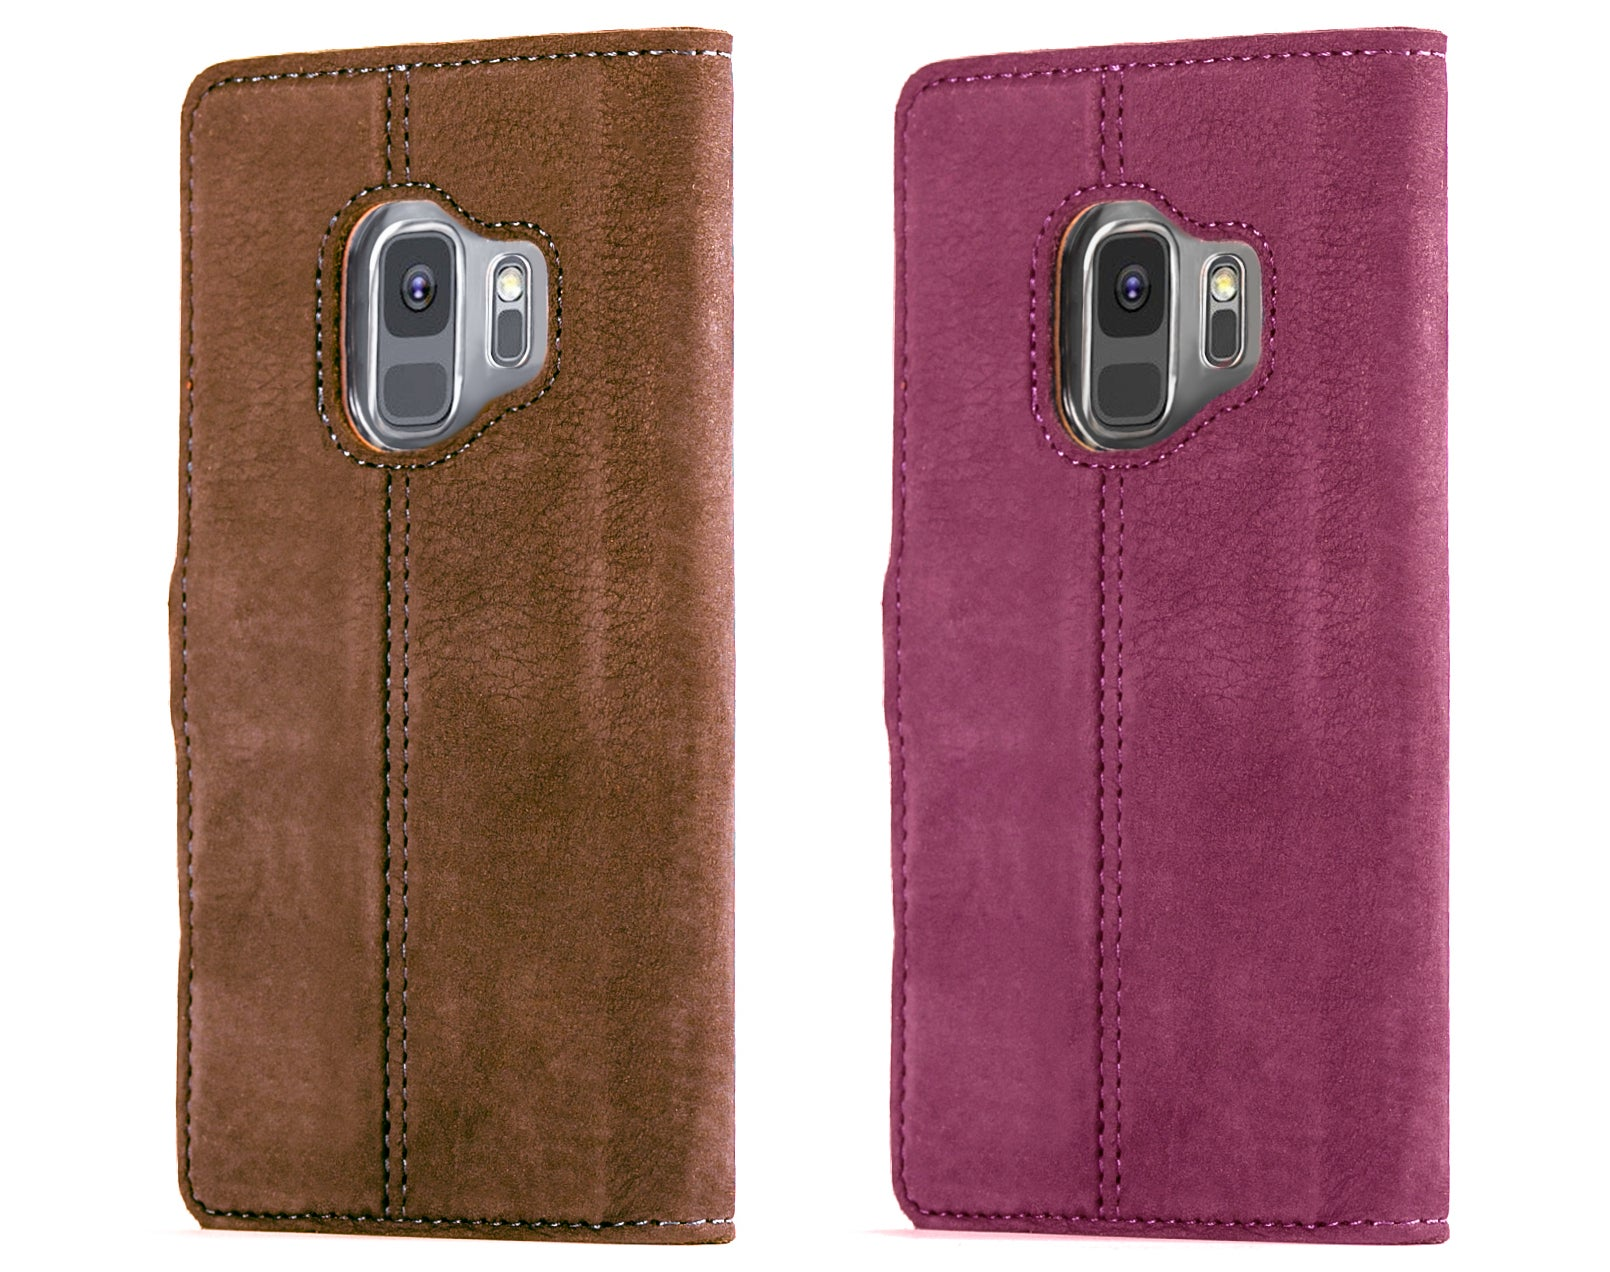 sale retailer 8c35c db974 Best Samsung Galaxy S9 Cases: Keep your shiny new Samsung safe ...